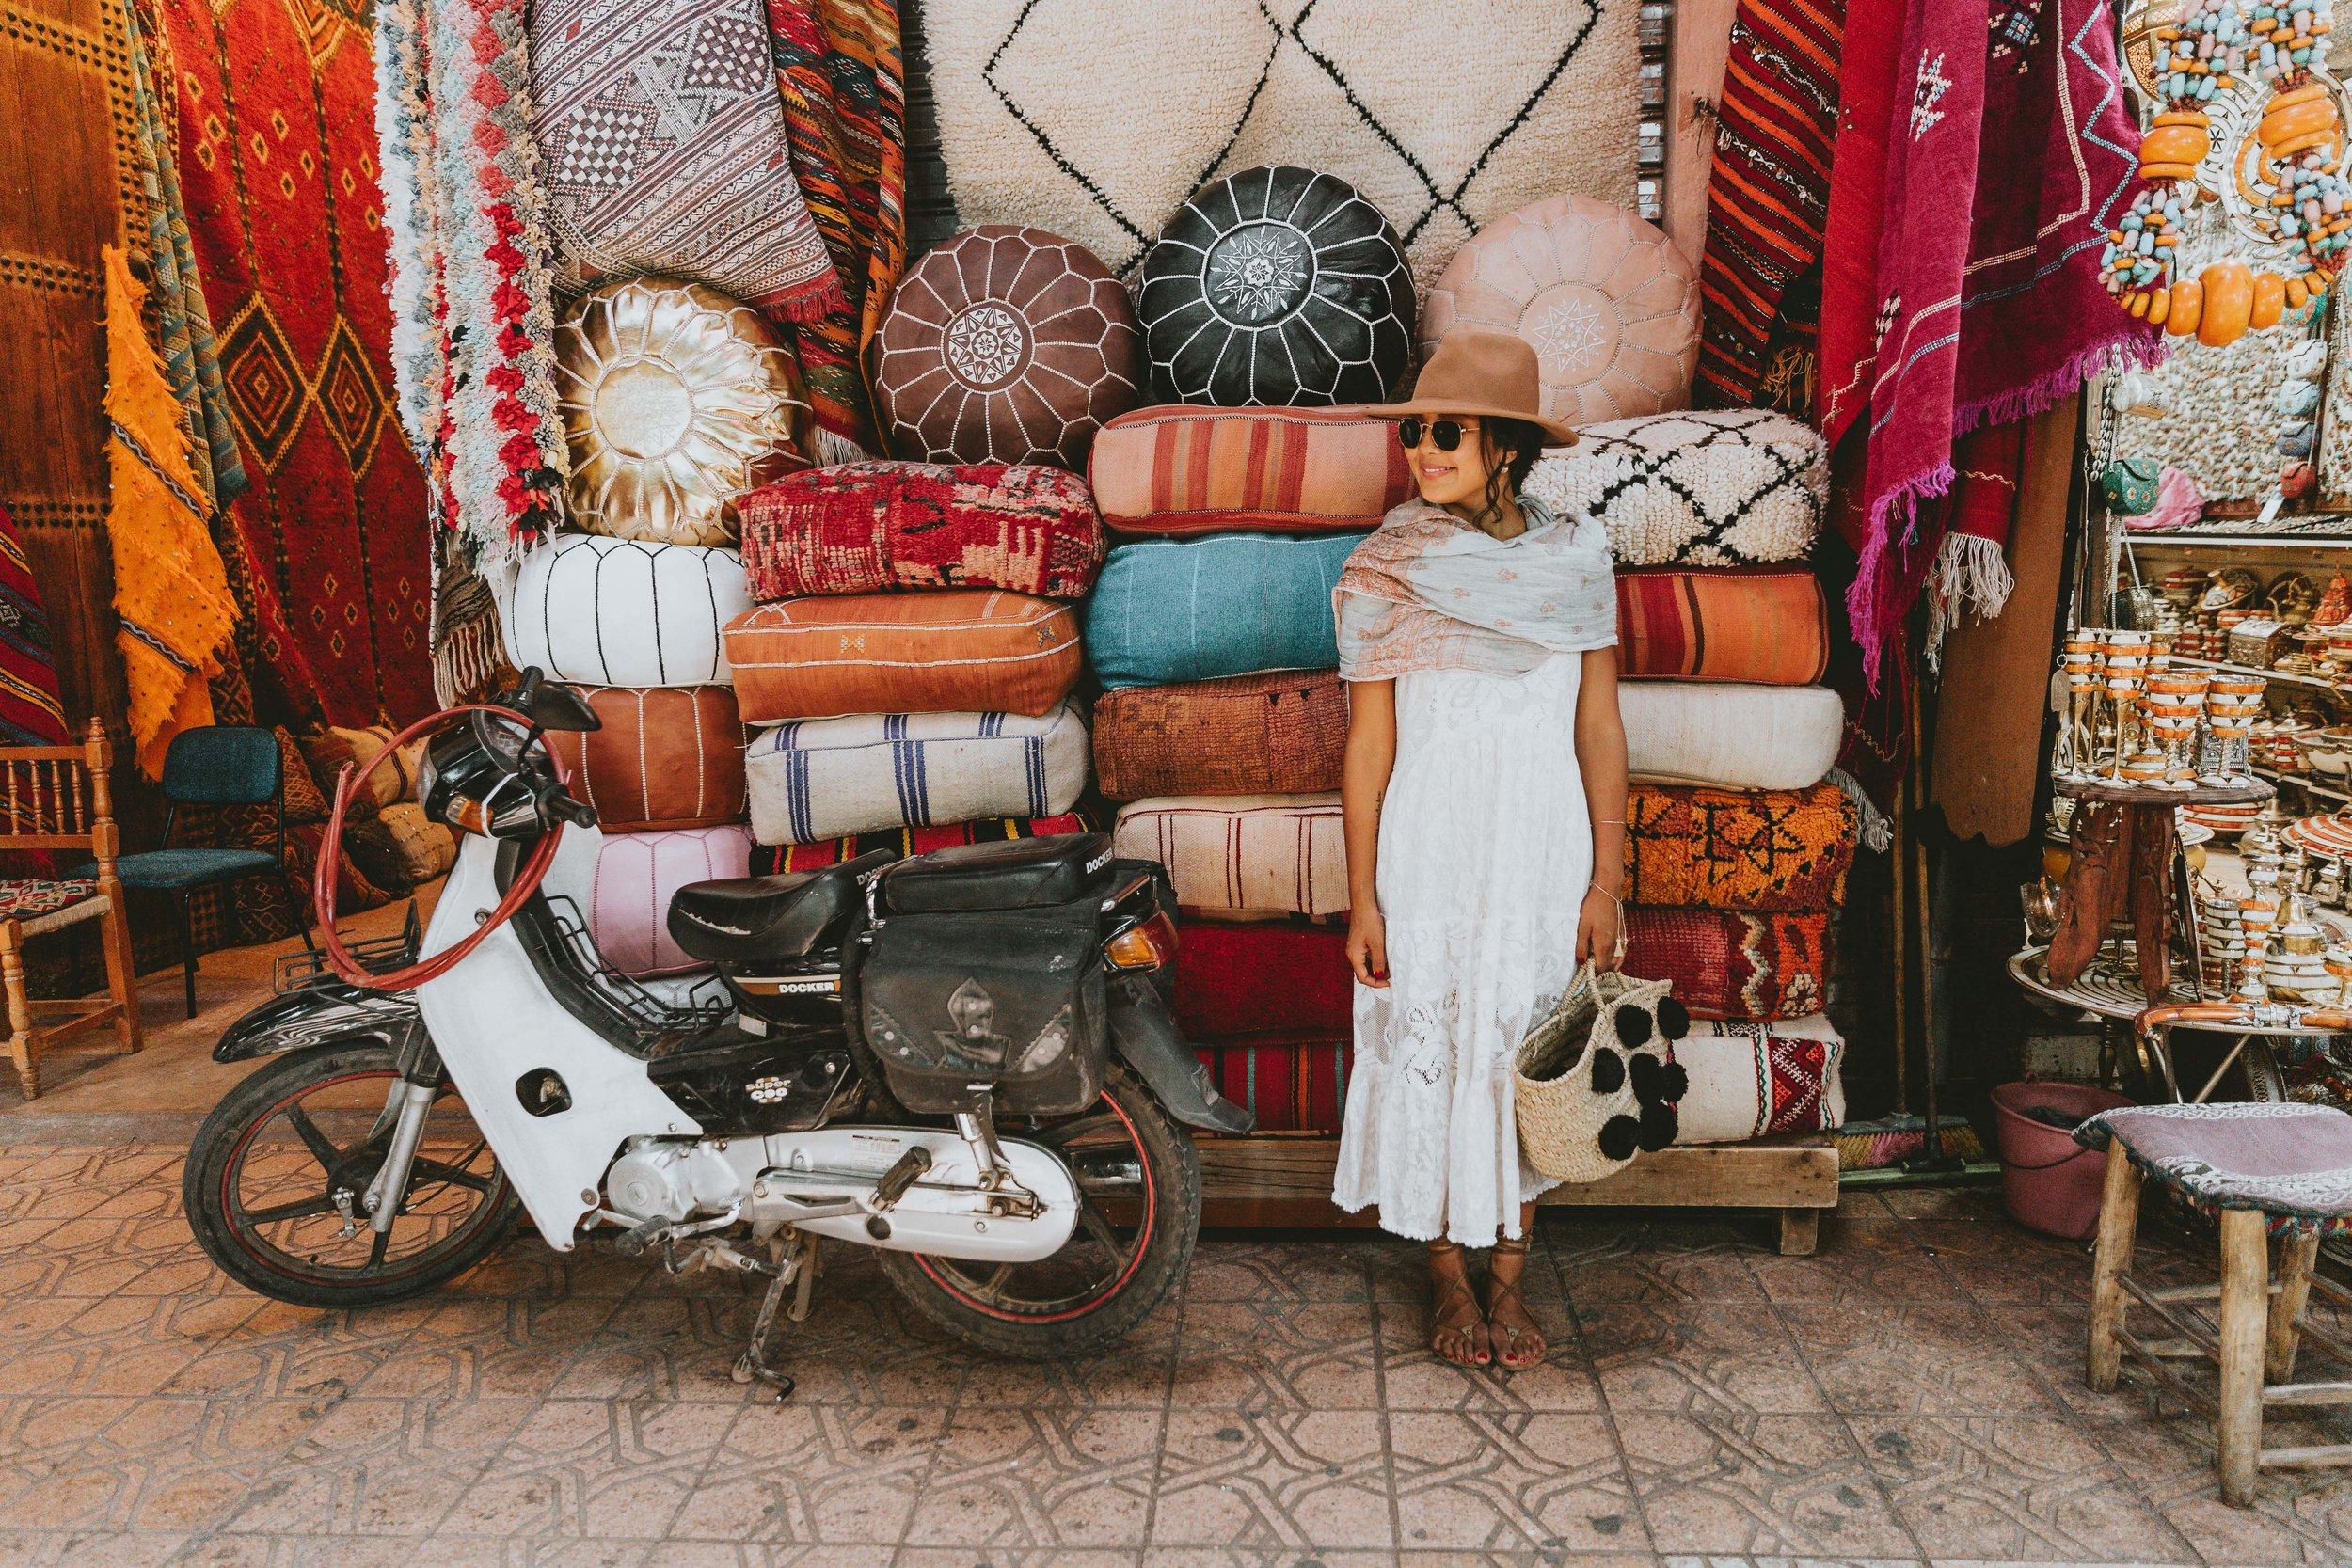 Shopping_Marrakech_Souks_What_To_Wear.jpg